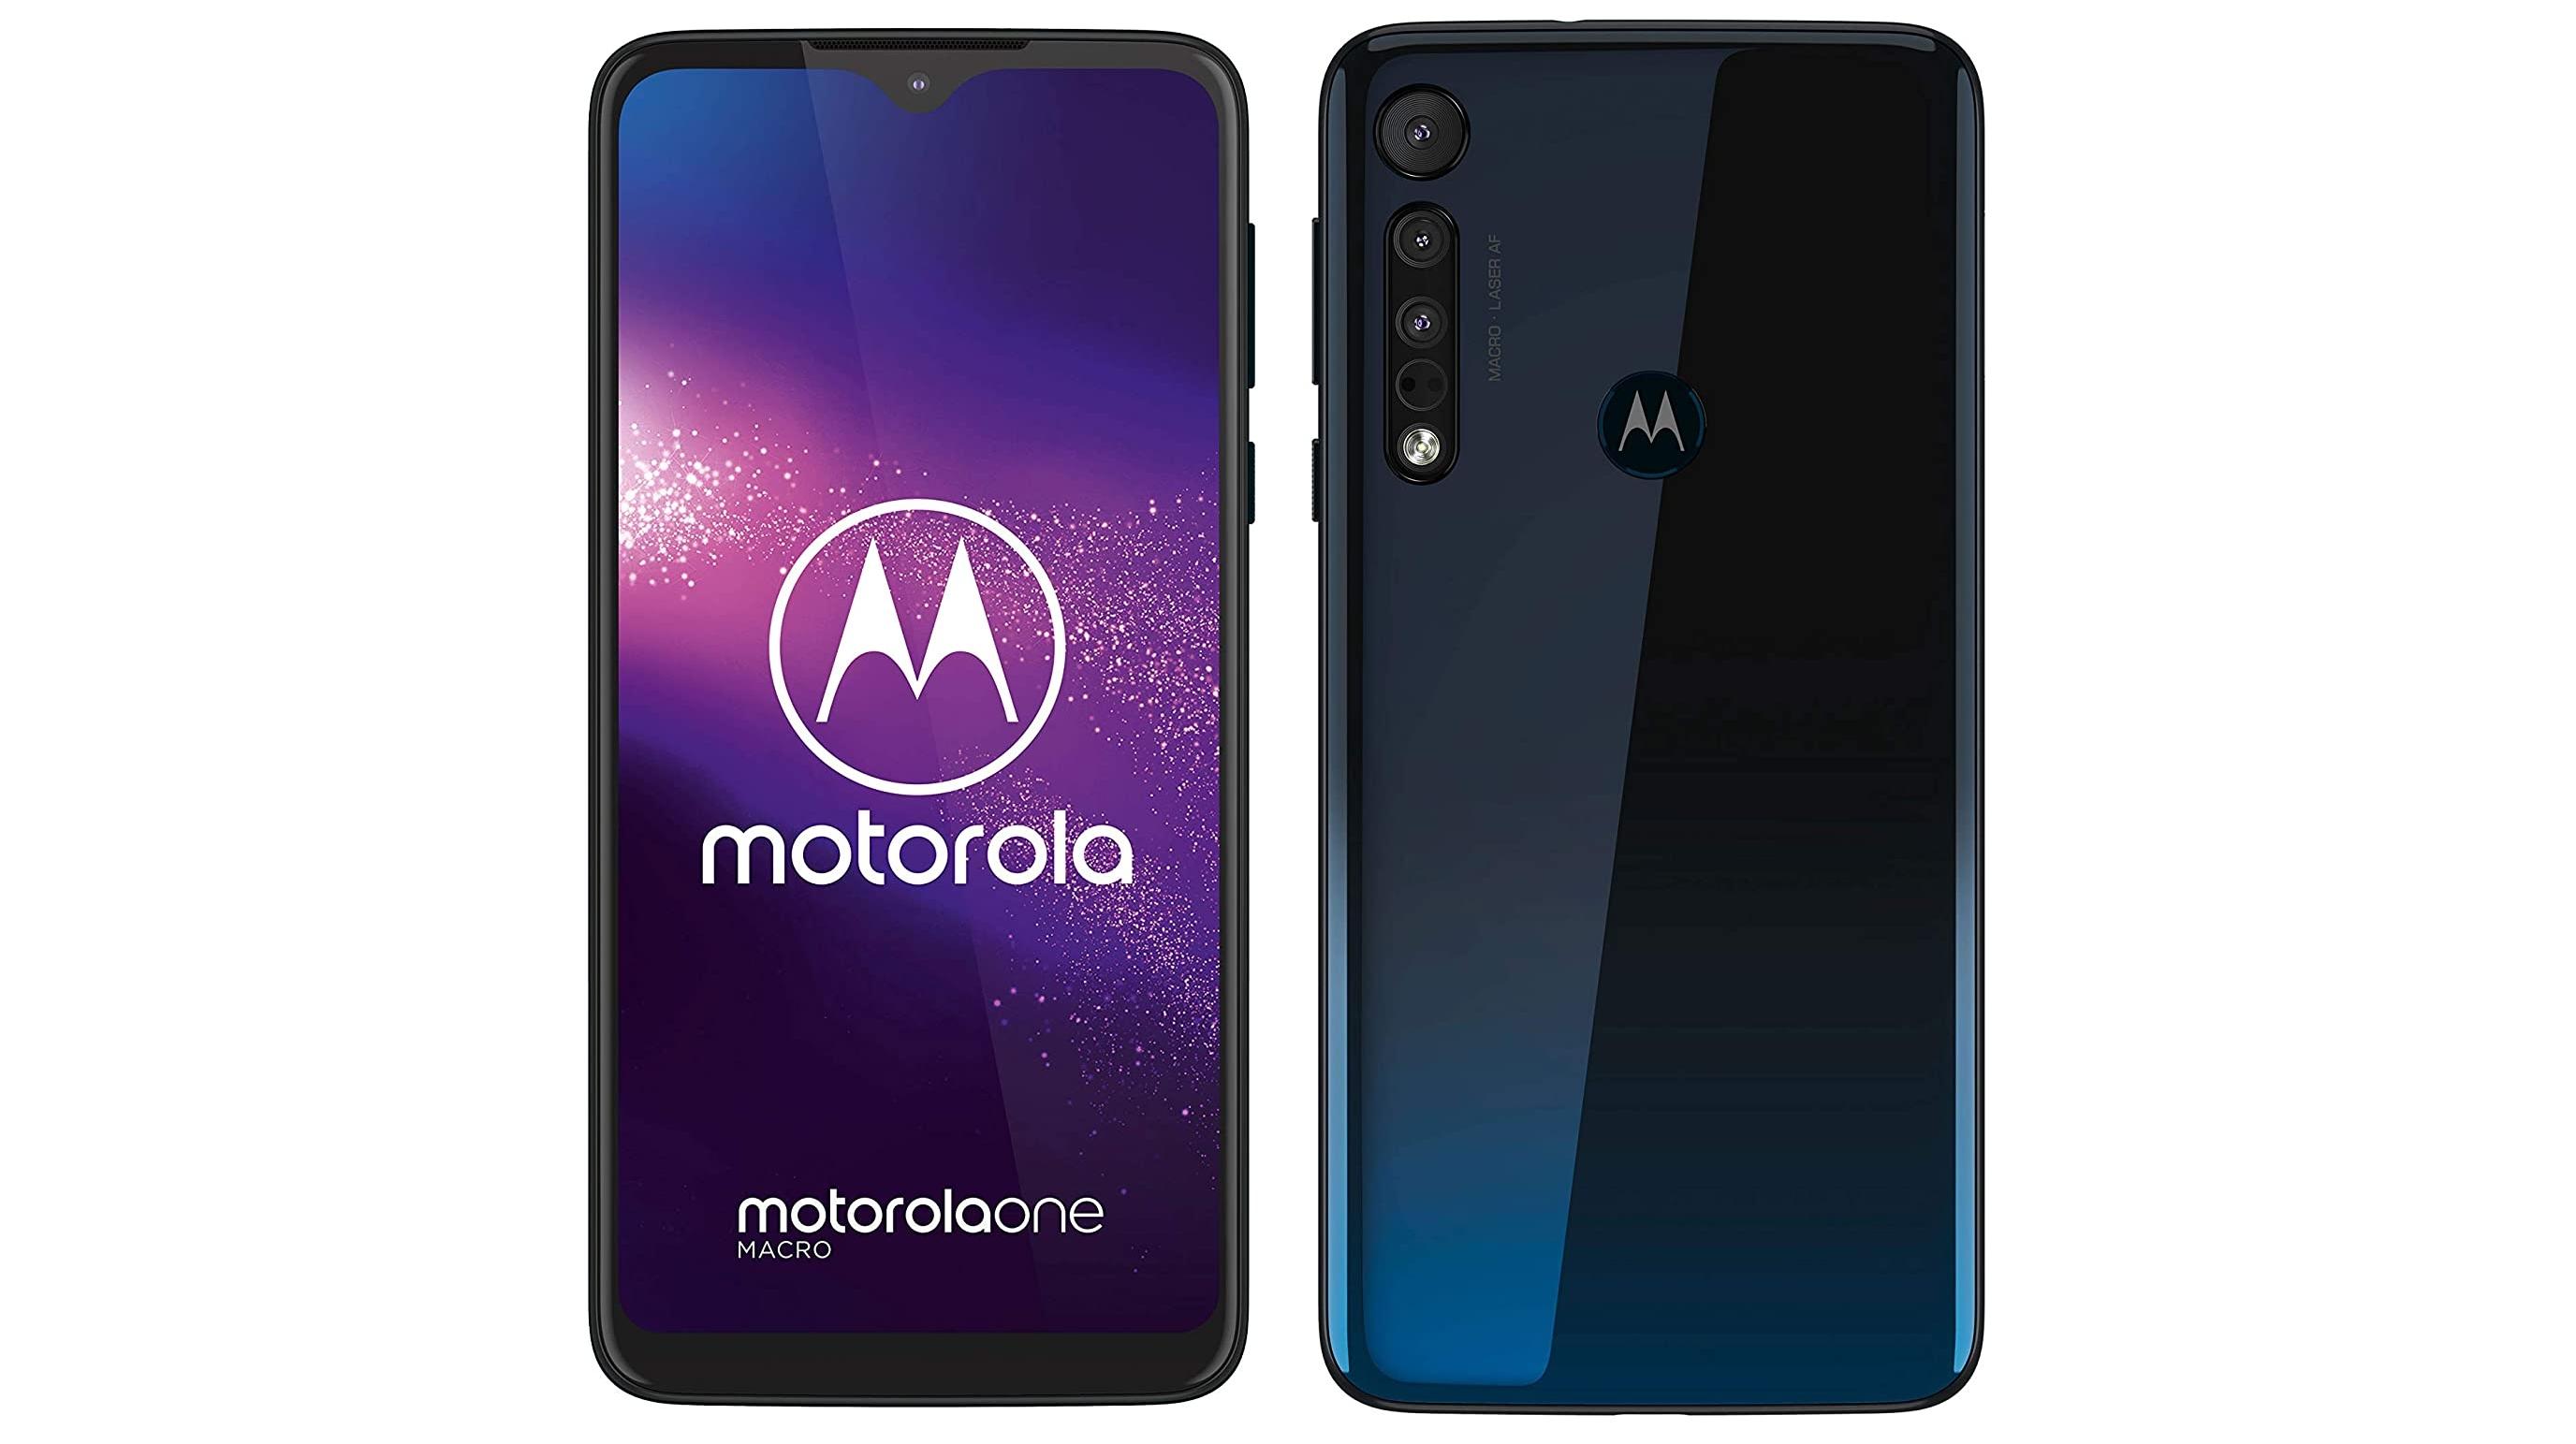 A Motorola One Macro against a white background